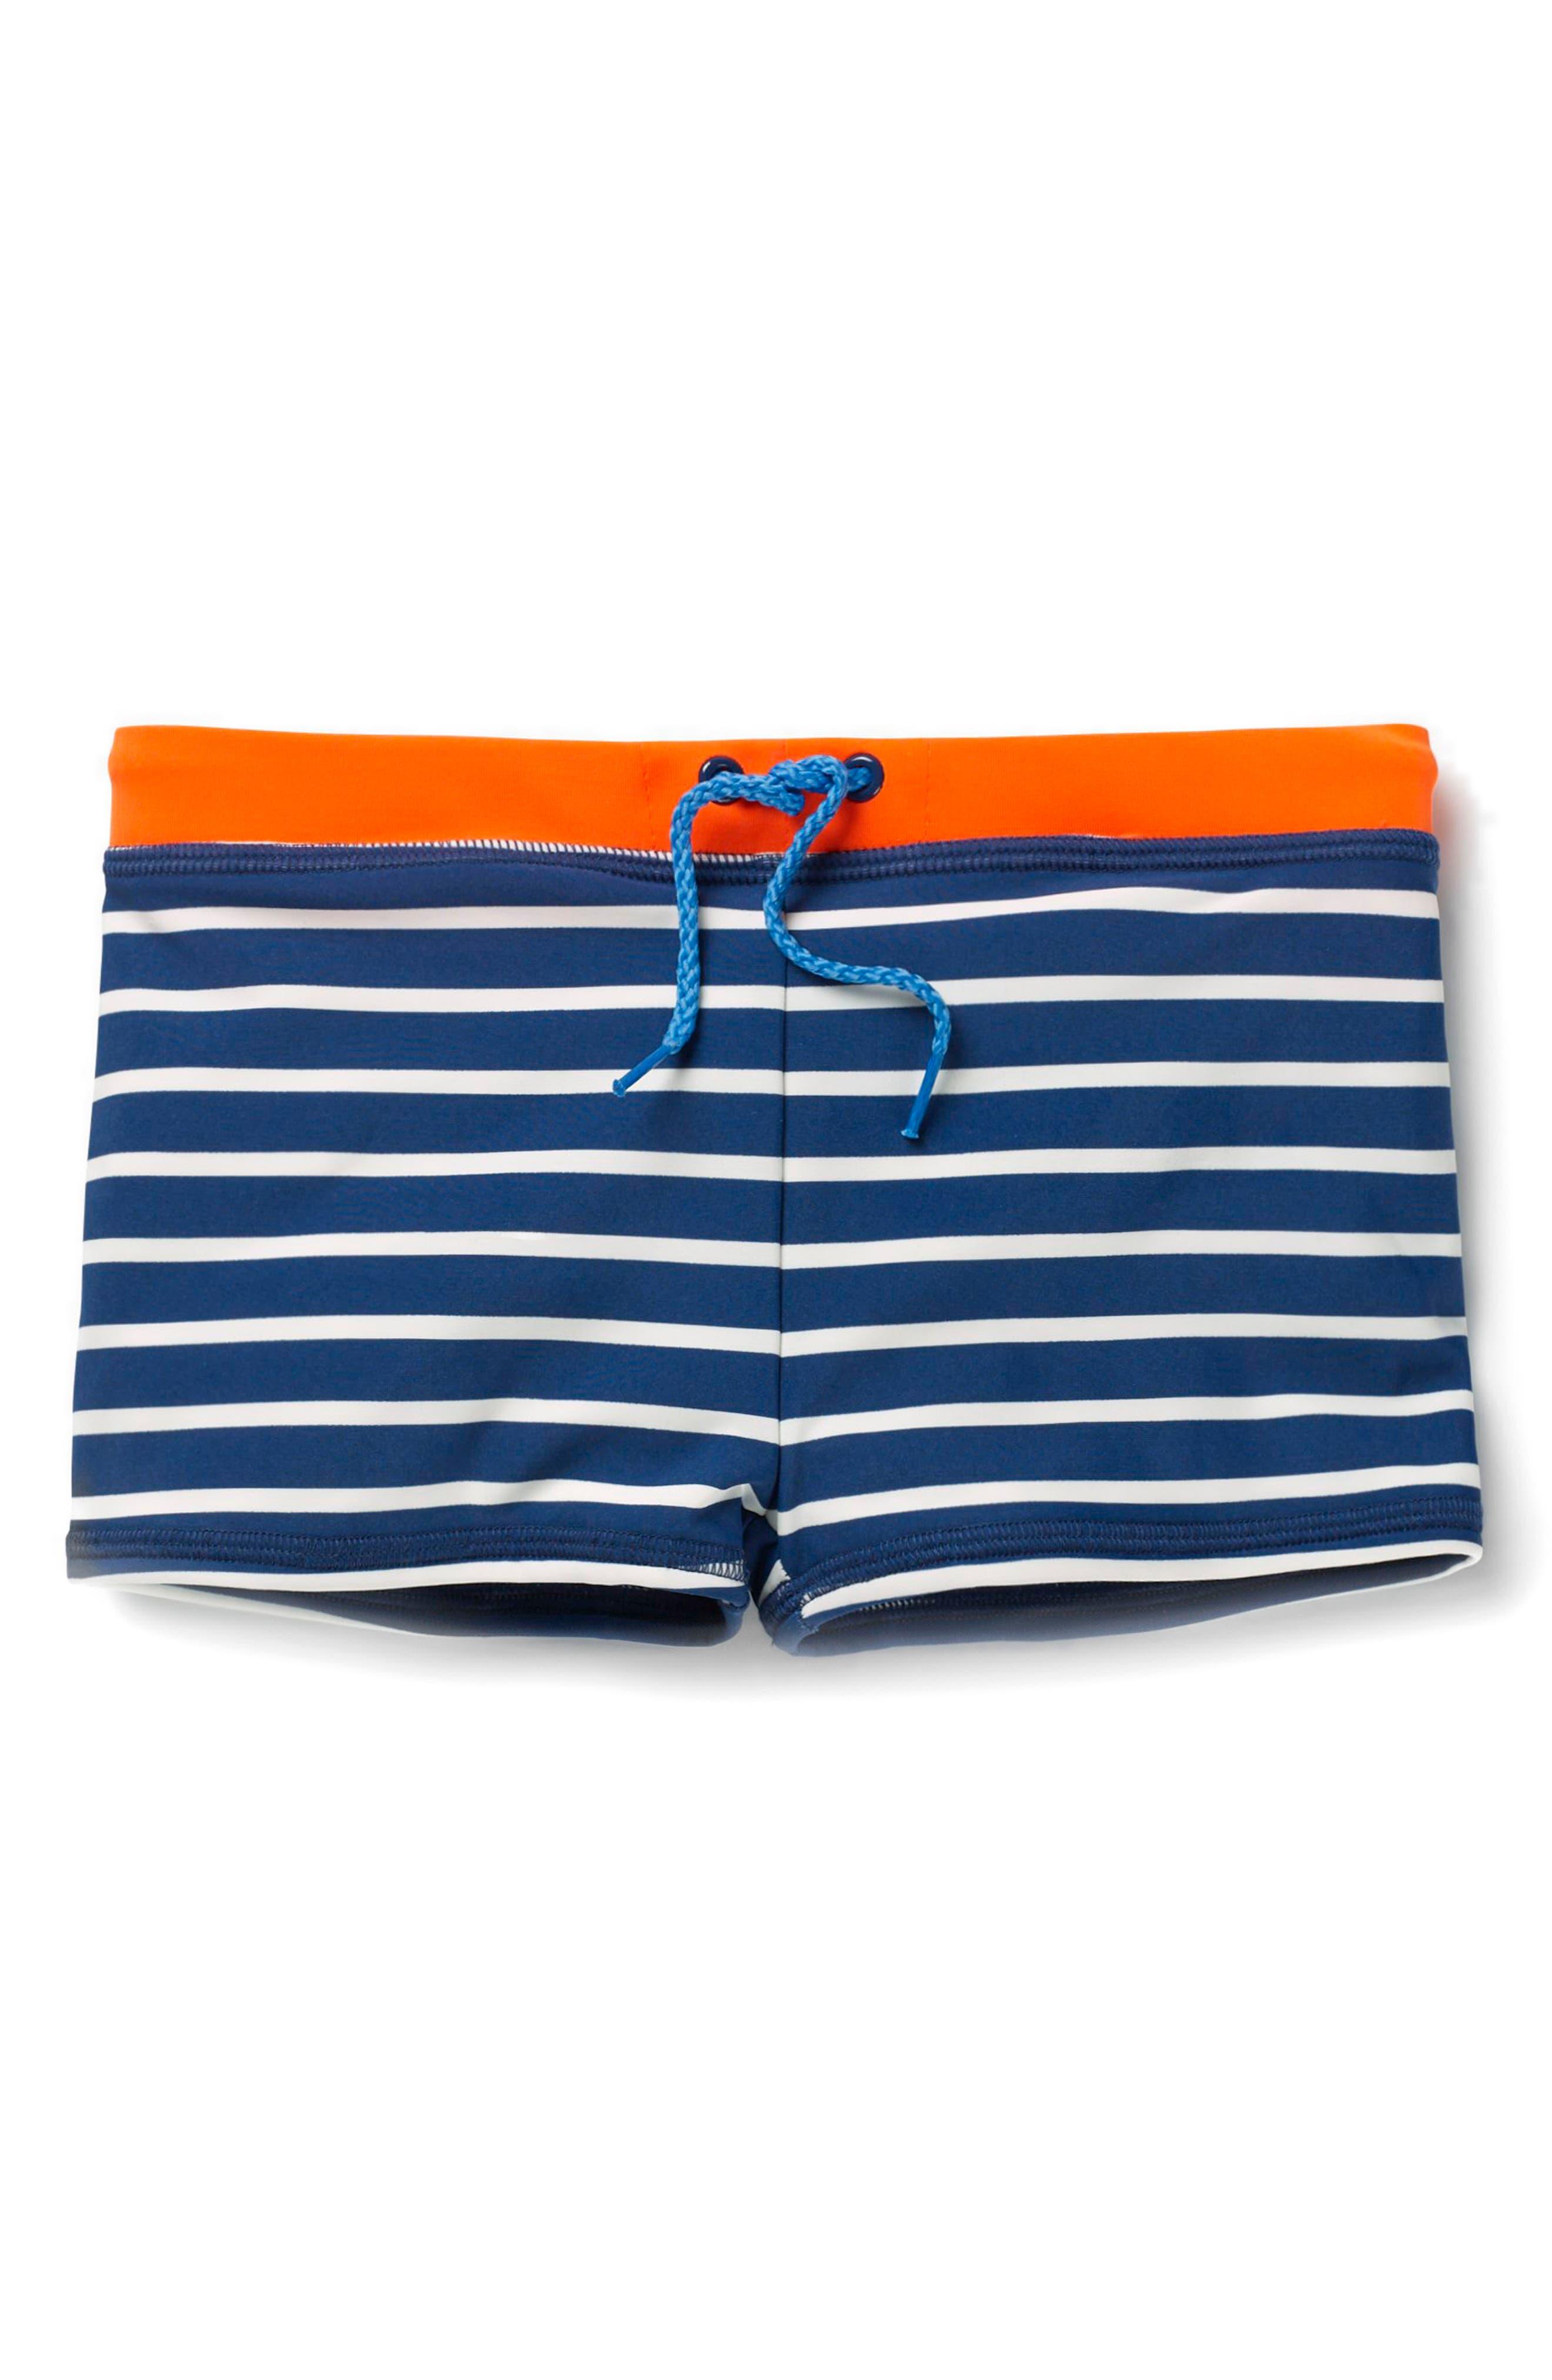 Swim Trunks,                         Main,                         color, 414